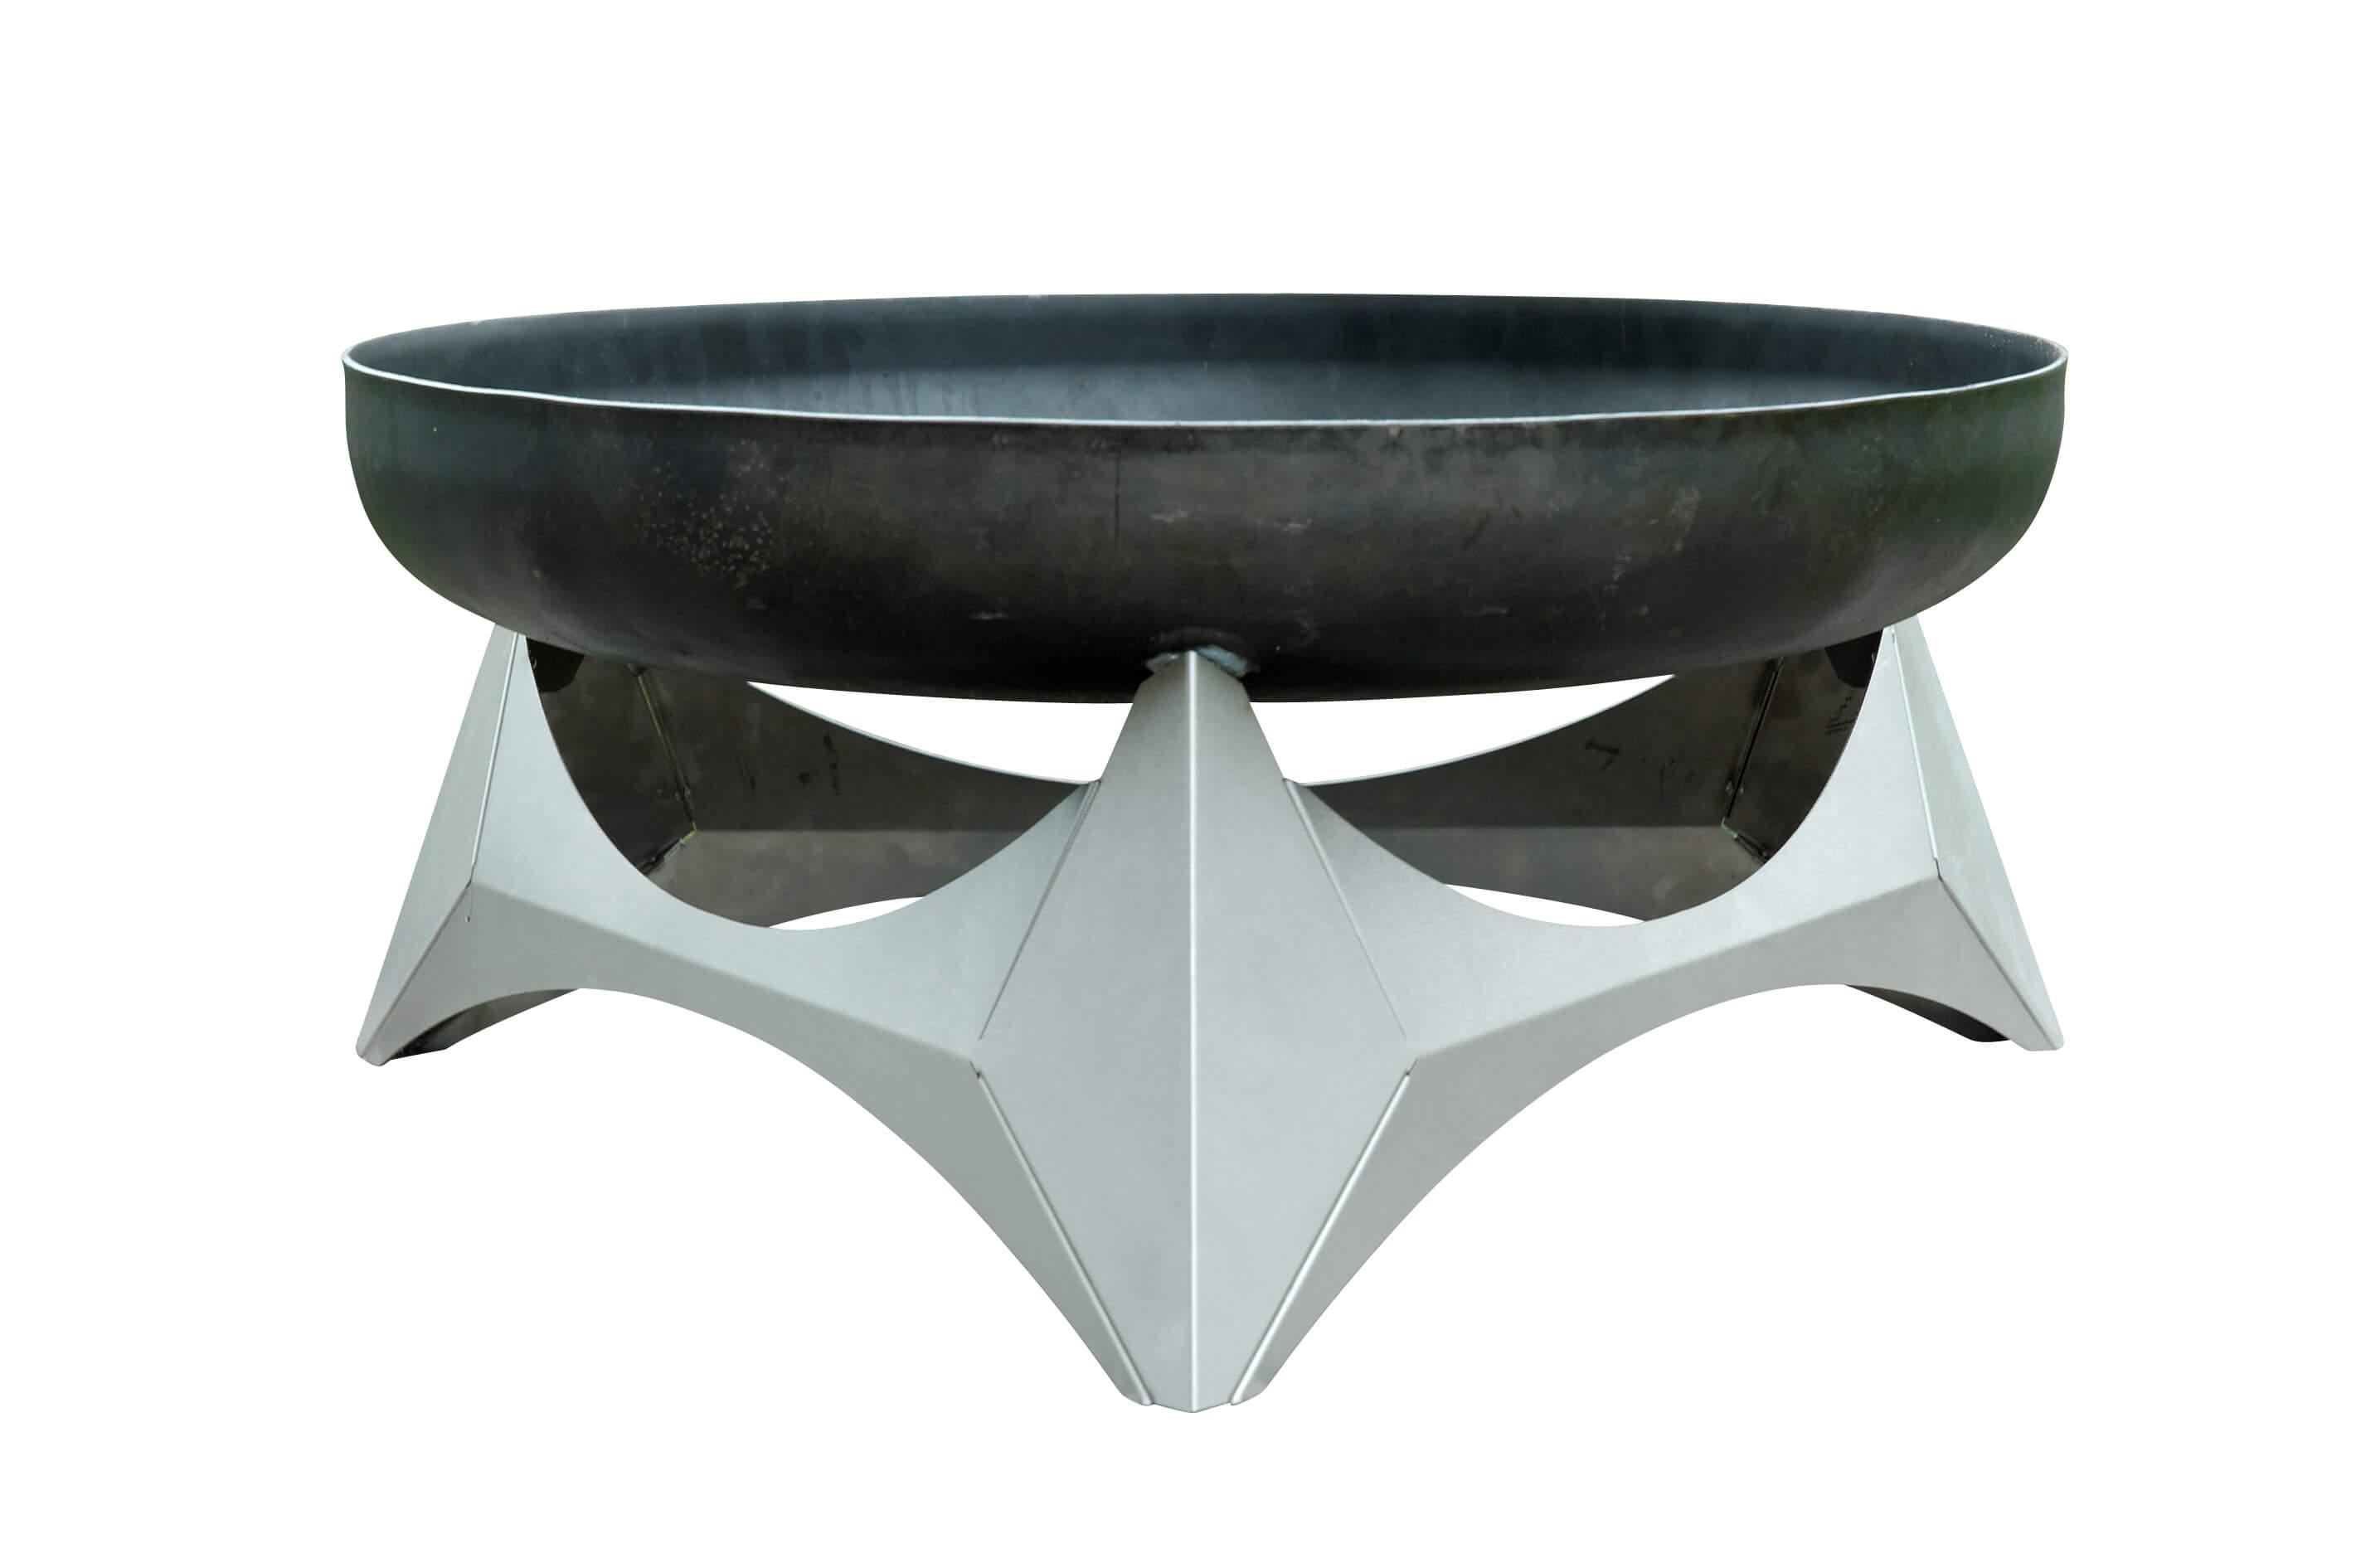 design feuerschale arka aus rohstahl mit edelstahl fu. Black Bedroom Furniture Sets. Home Design Ideas